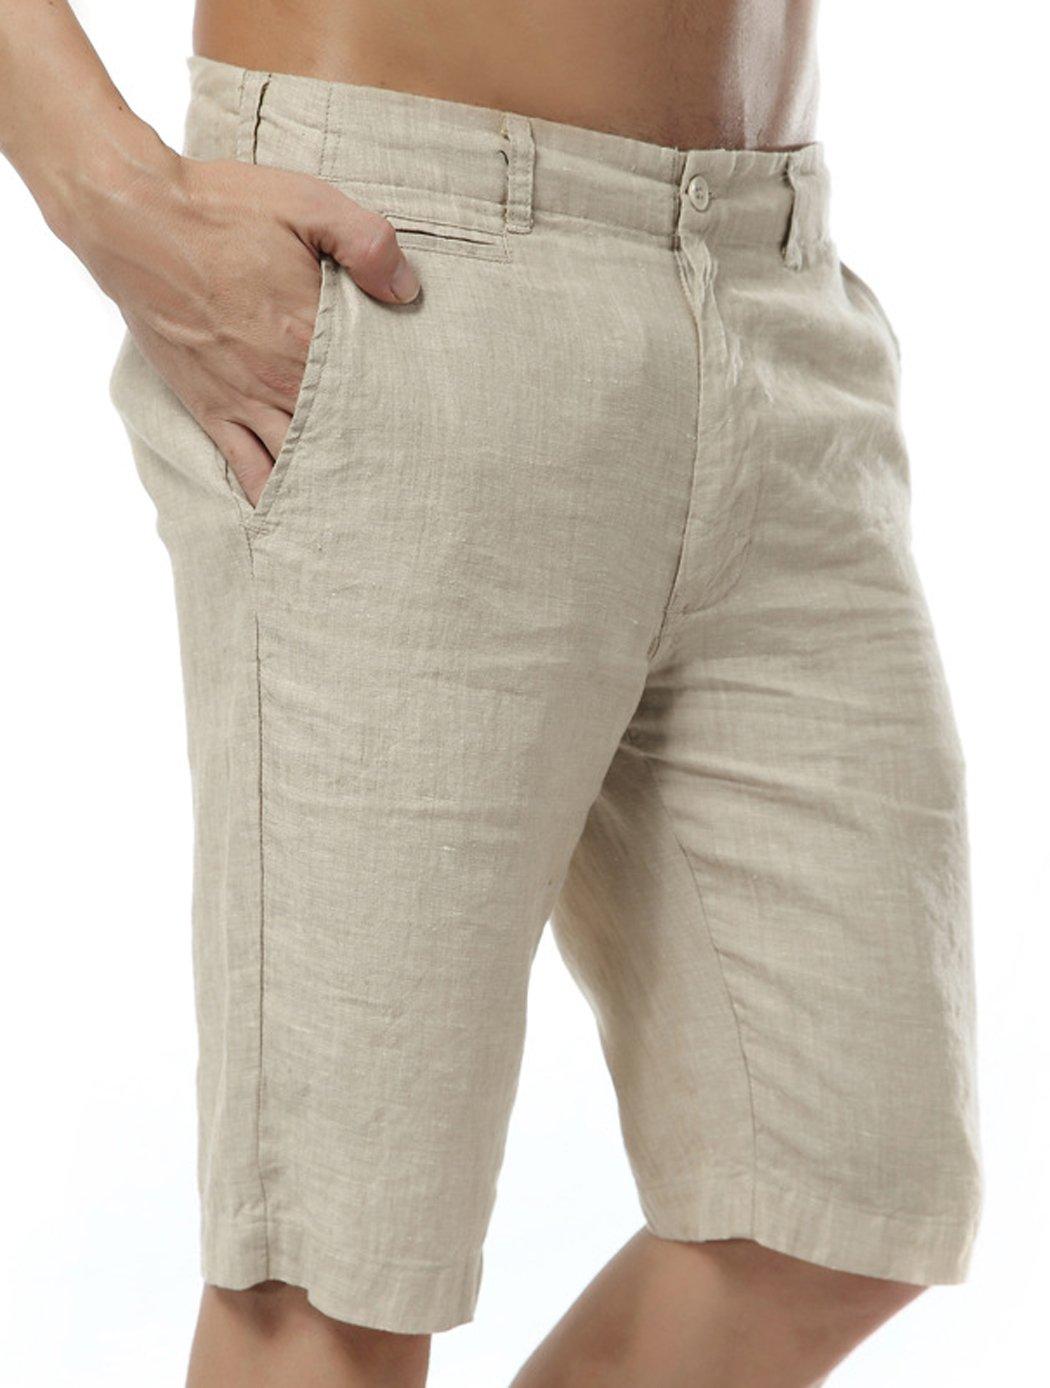 utcoco Men's Summer Straight Fit Flat-Front Linen Shorts (Medium, Khaki) by utcoco (Image #3)